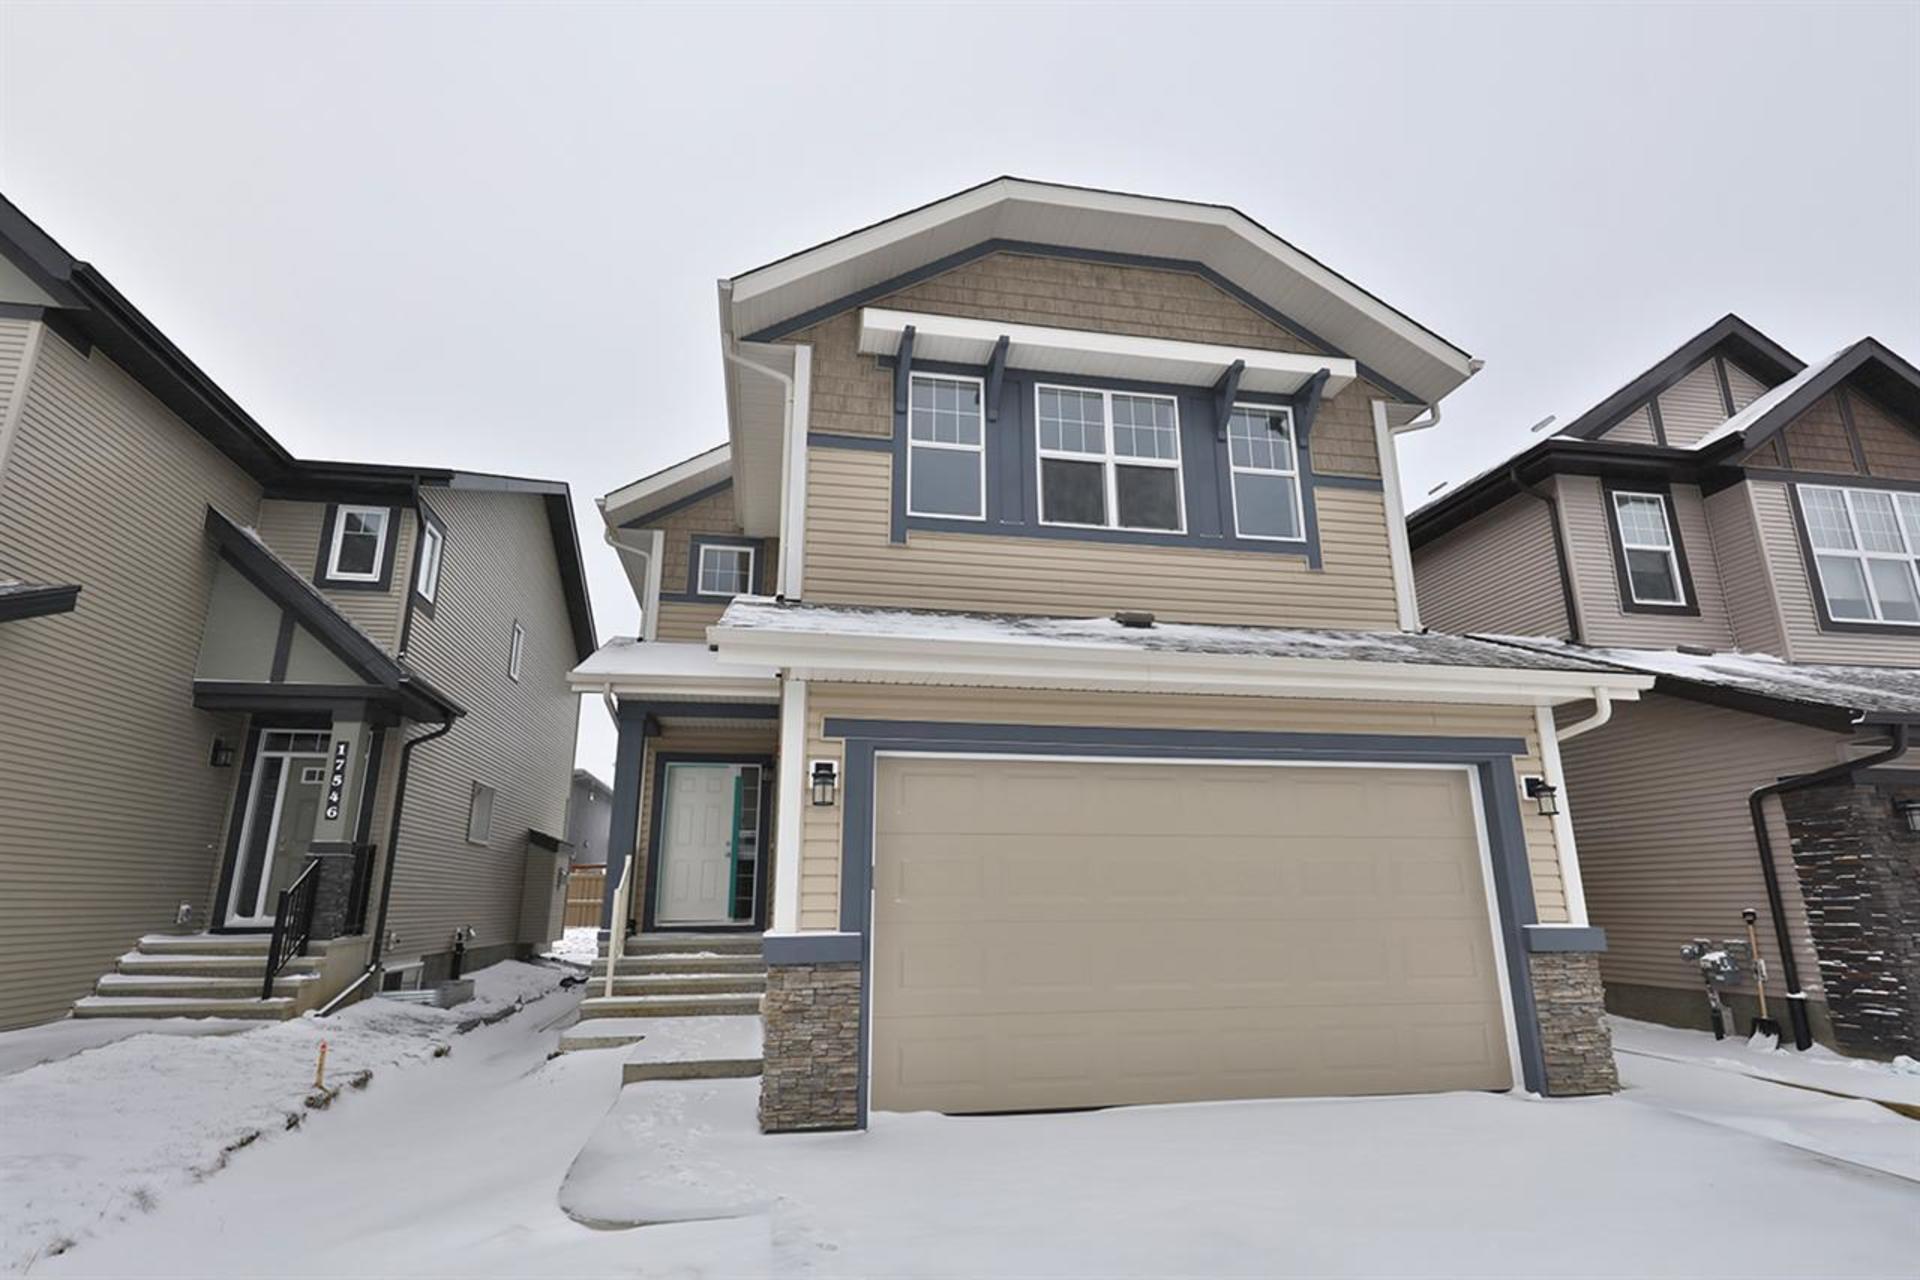 17550-60a-street-mcconachie-area-edmonton-01 at 17550 60a Street, McConachie Area, Edmonton